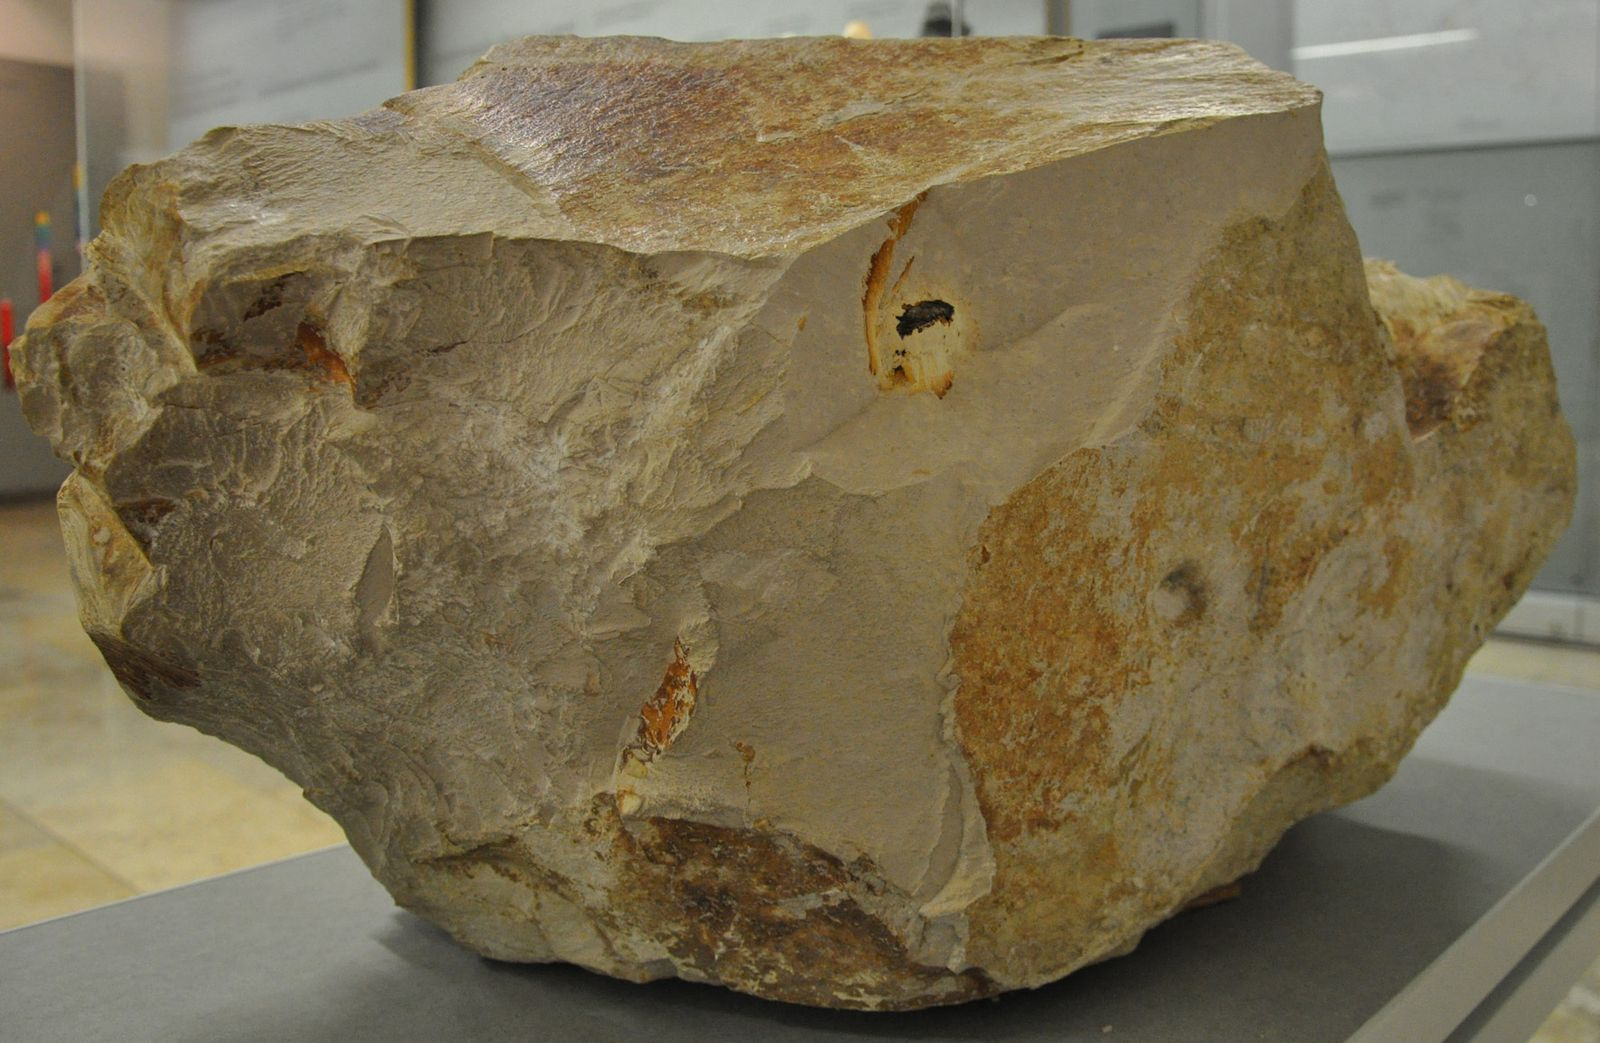 EINMALIGE VERWENDUNG Meteorittensplitter